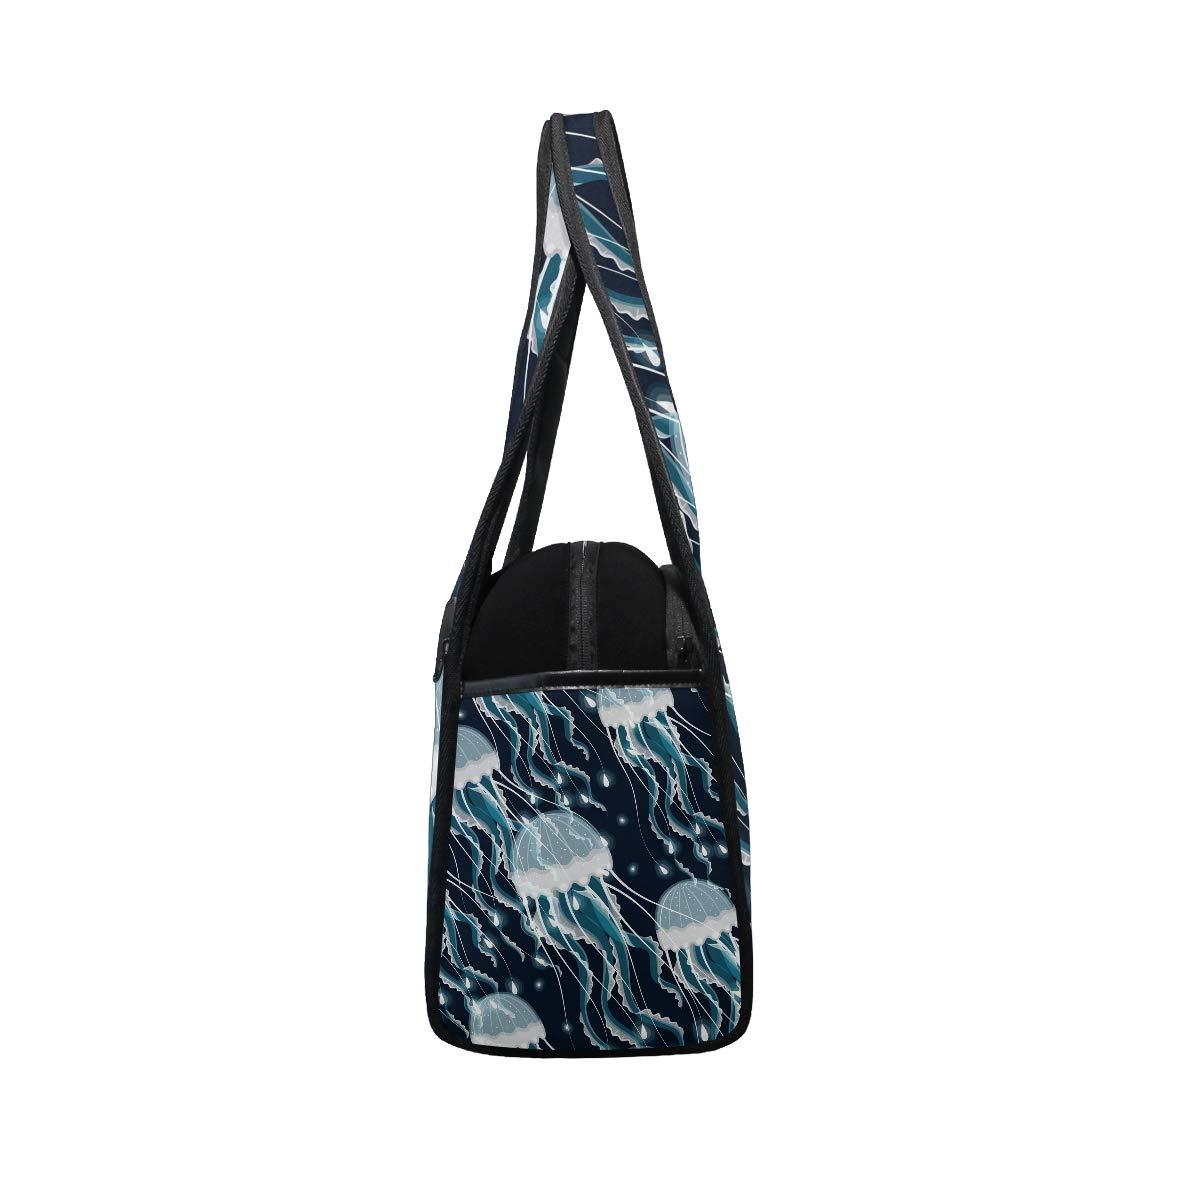 Gym Bag Sports Holdall Ocean Jellyfish Canvas Shoulder Bag Overnight Travel Bag for Men and Women